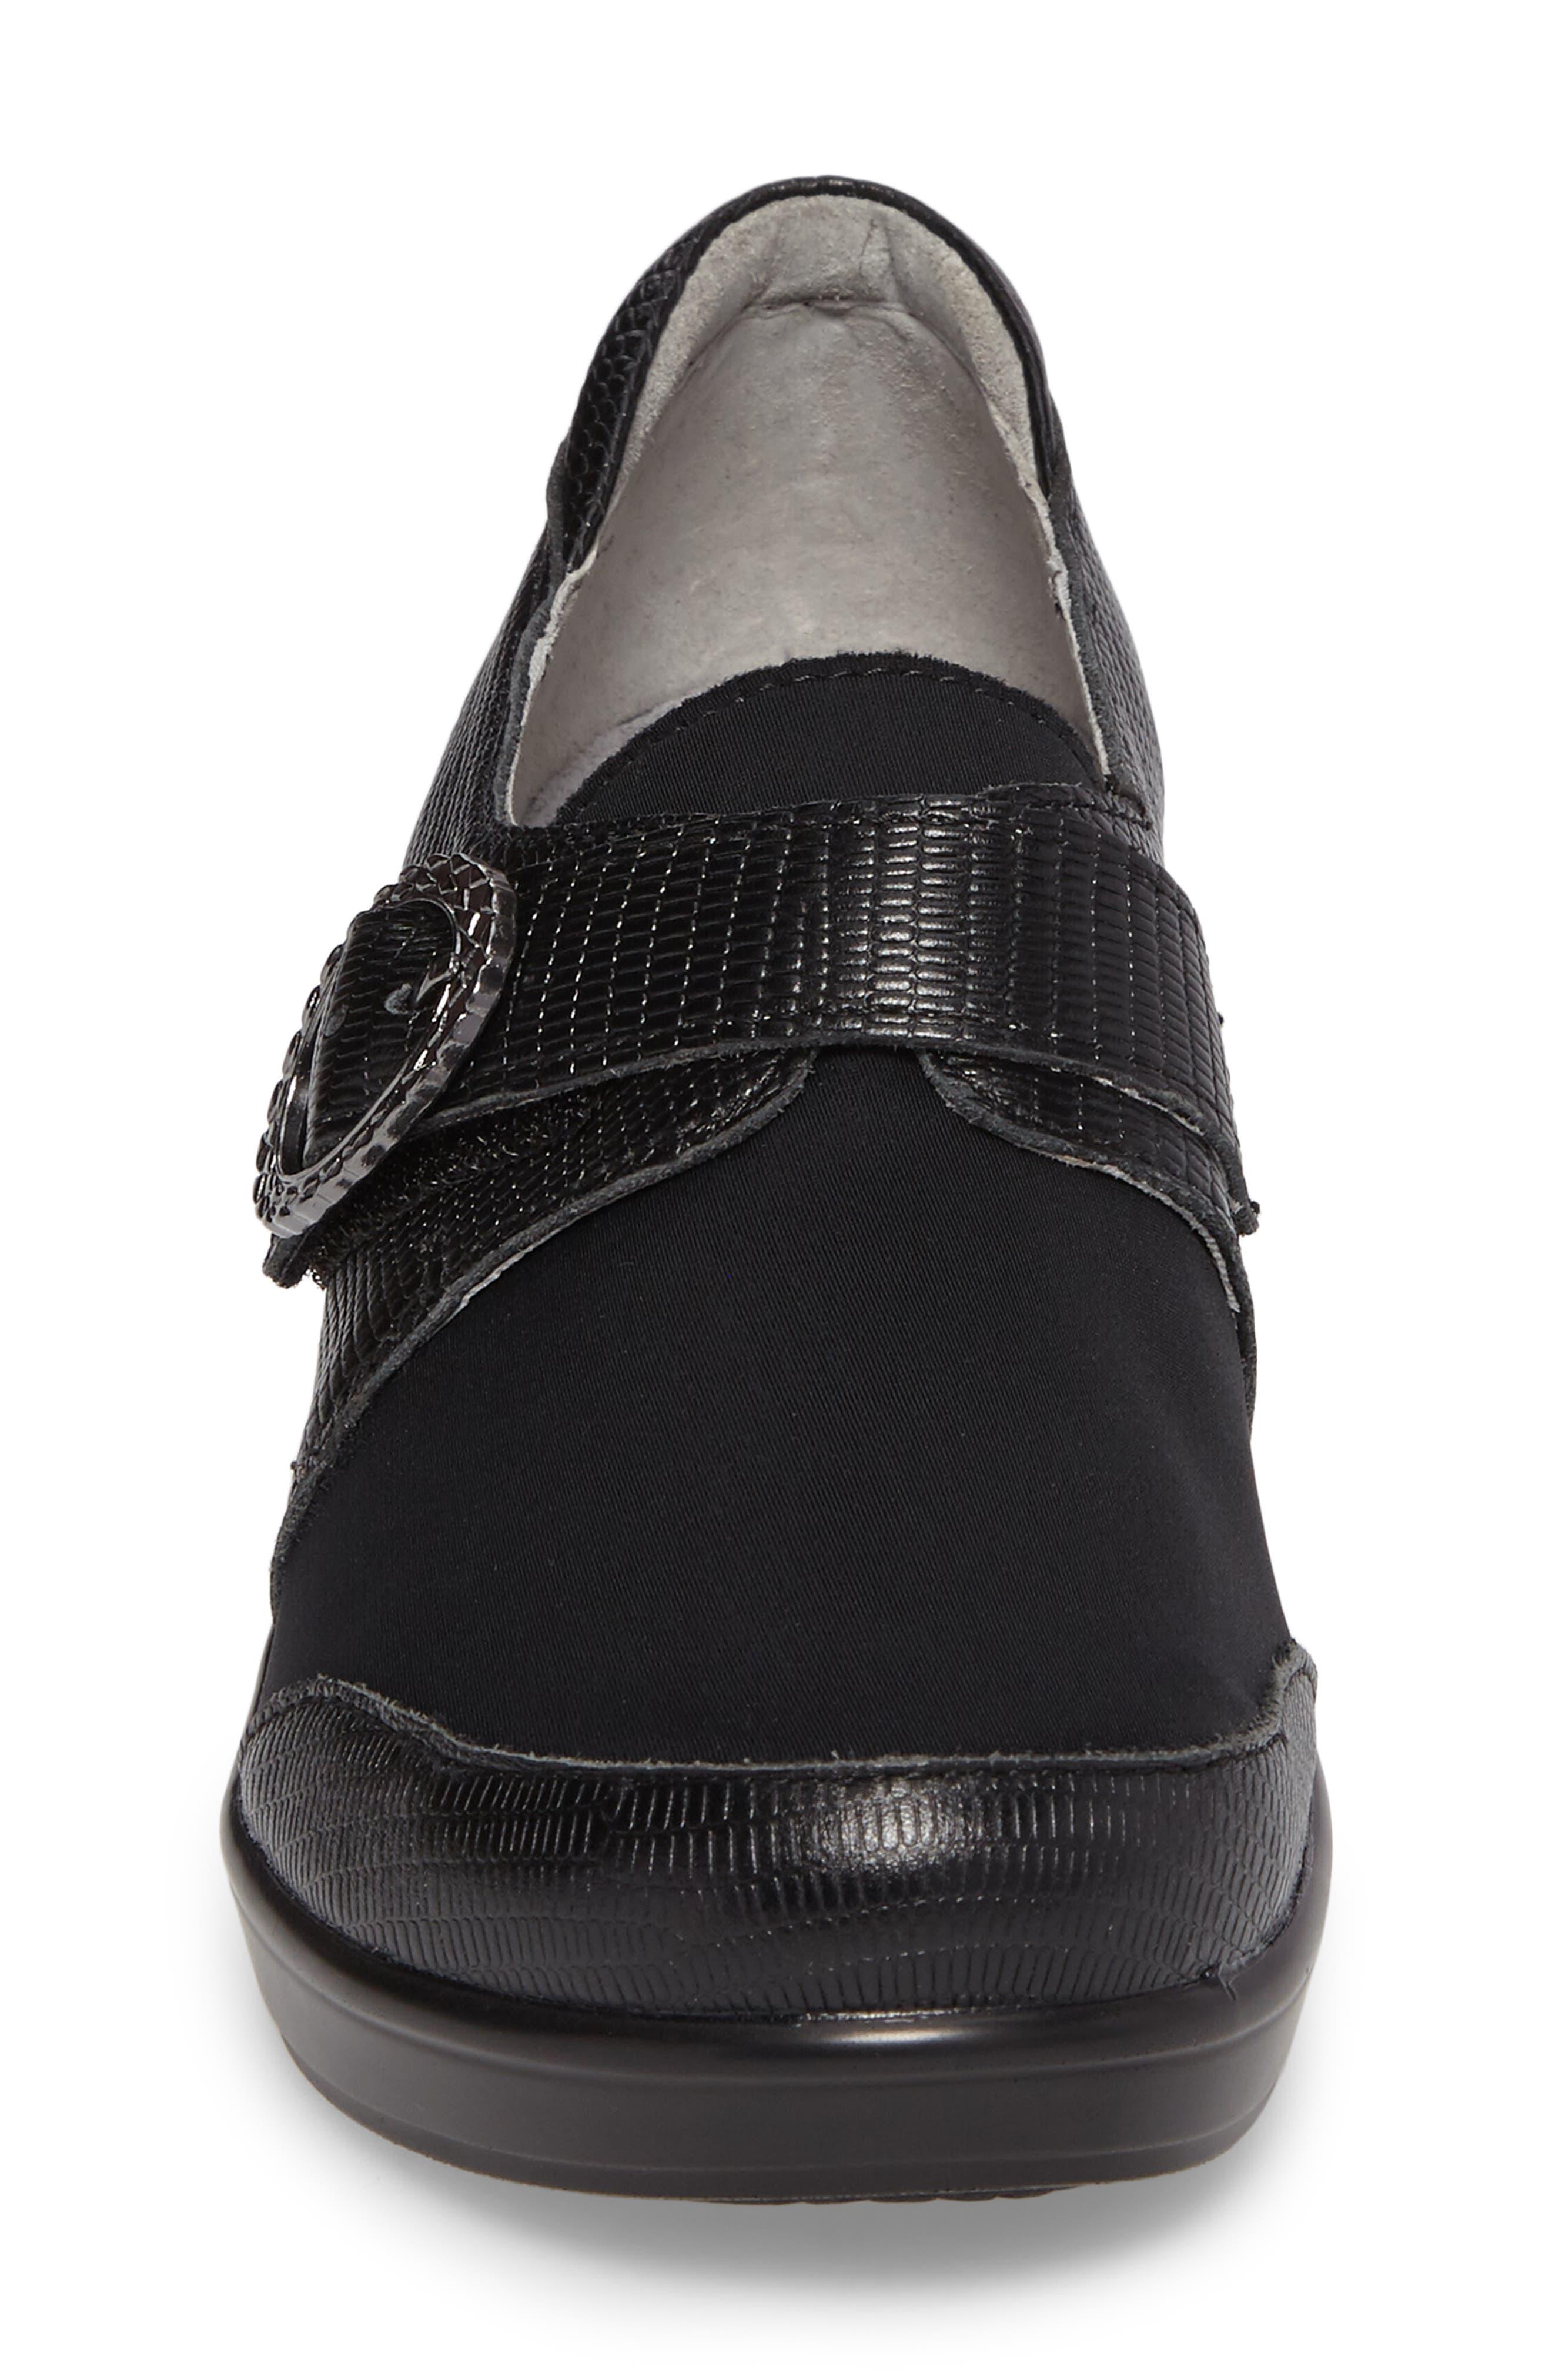 Holli Pump,                             Alternate thumbnail 4, color,                             Spiffy Black Leather